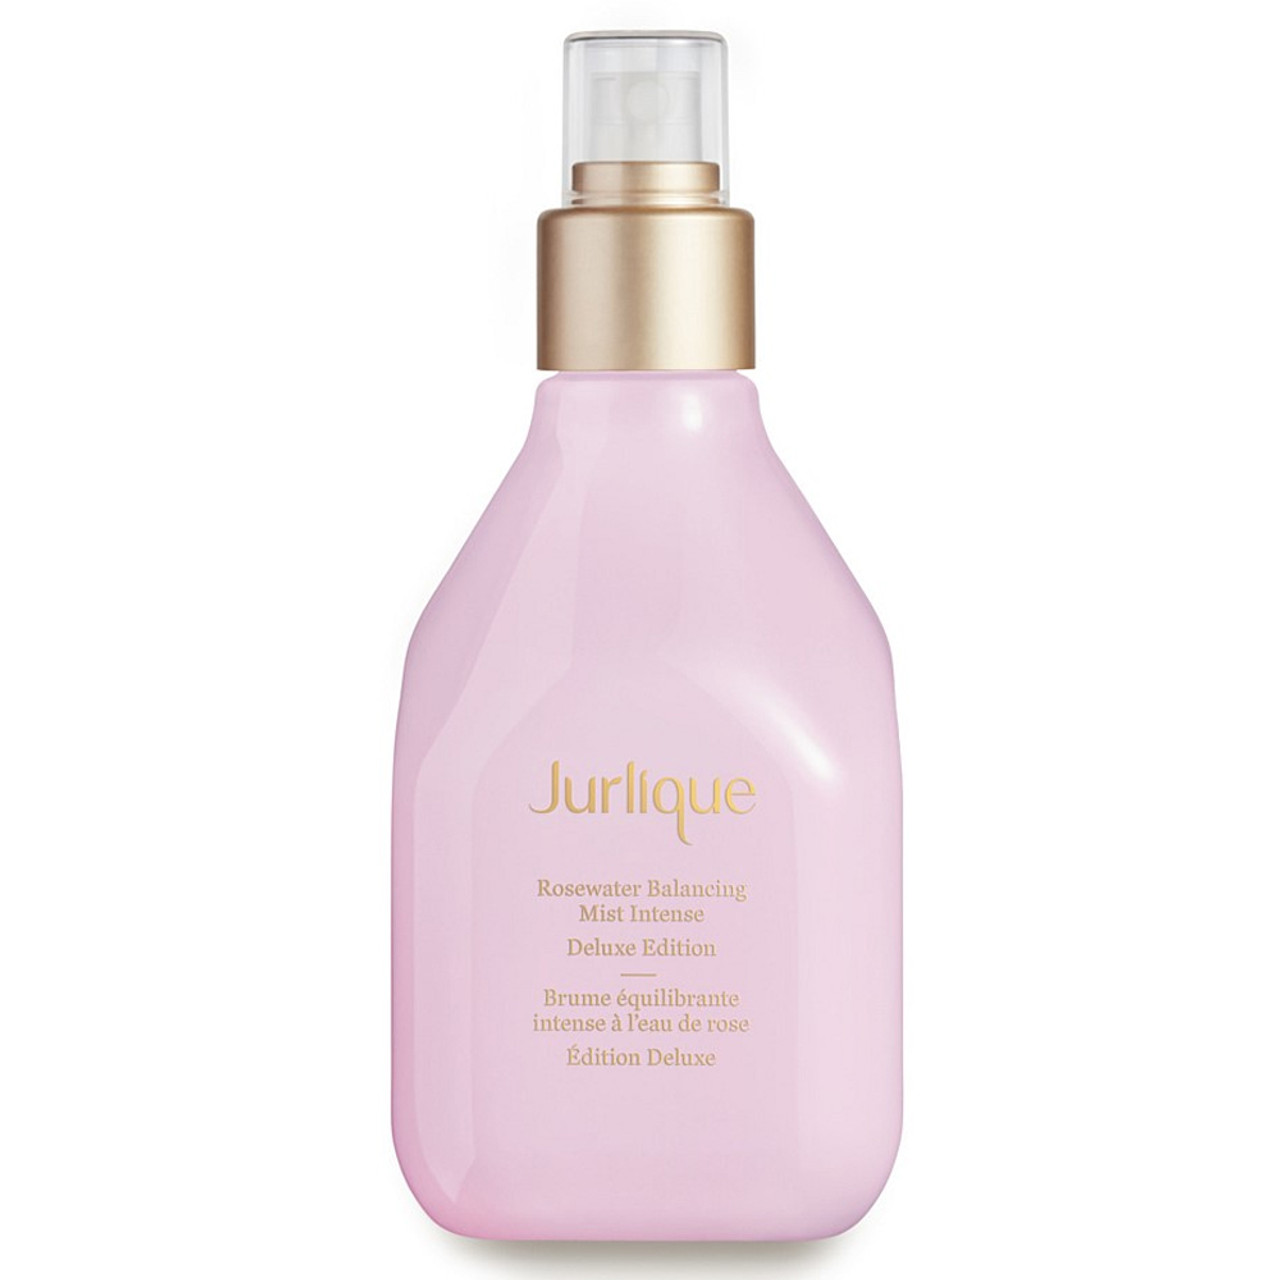 Jurlique Rosewater Balancing Mist Intense Deluxe Edition (200ml) (discontinued) BeautifiedYou.com